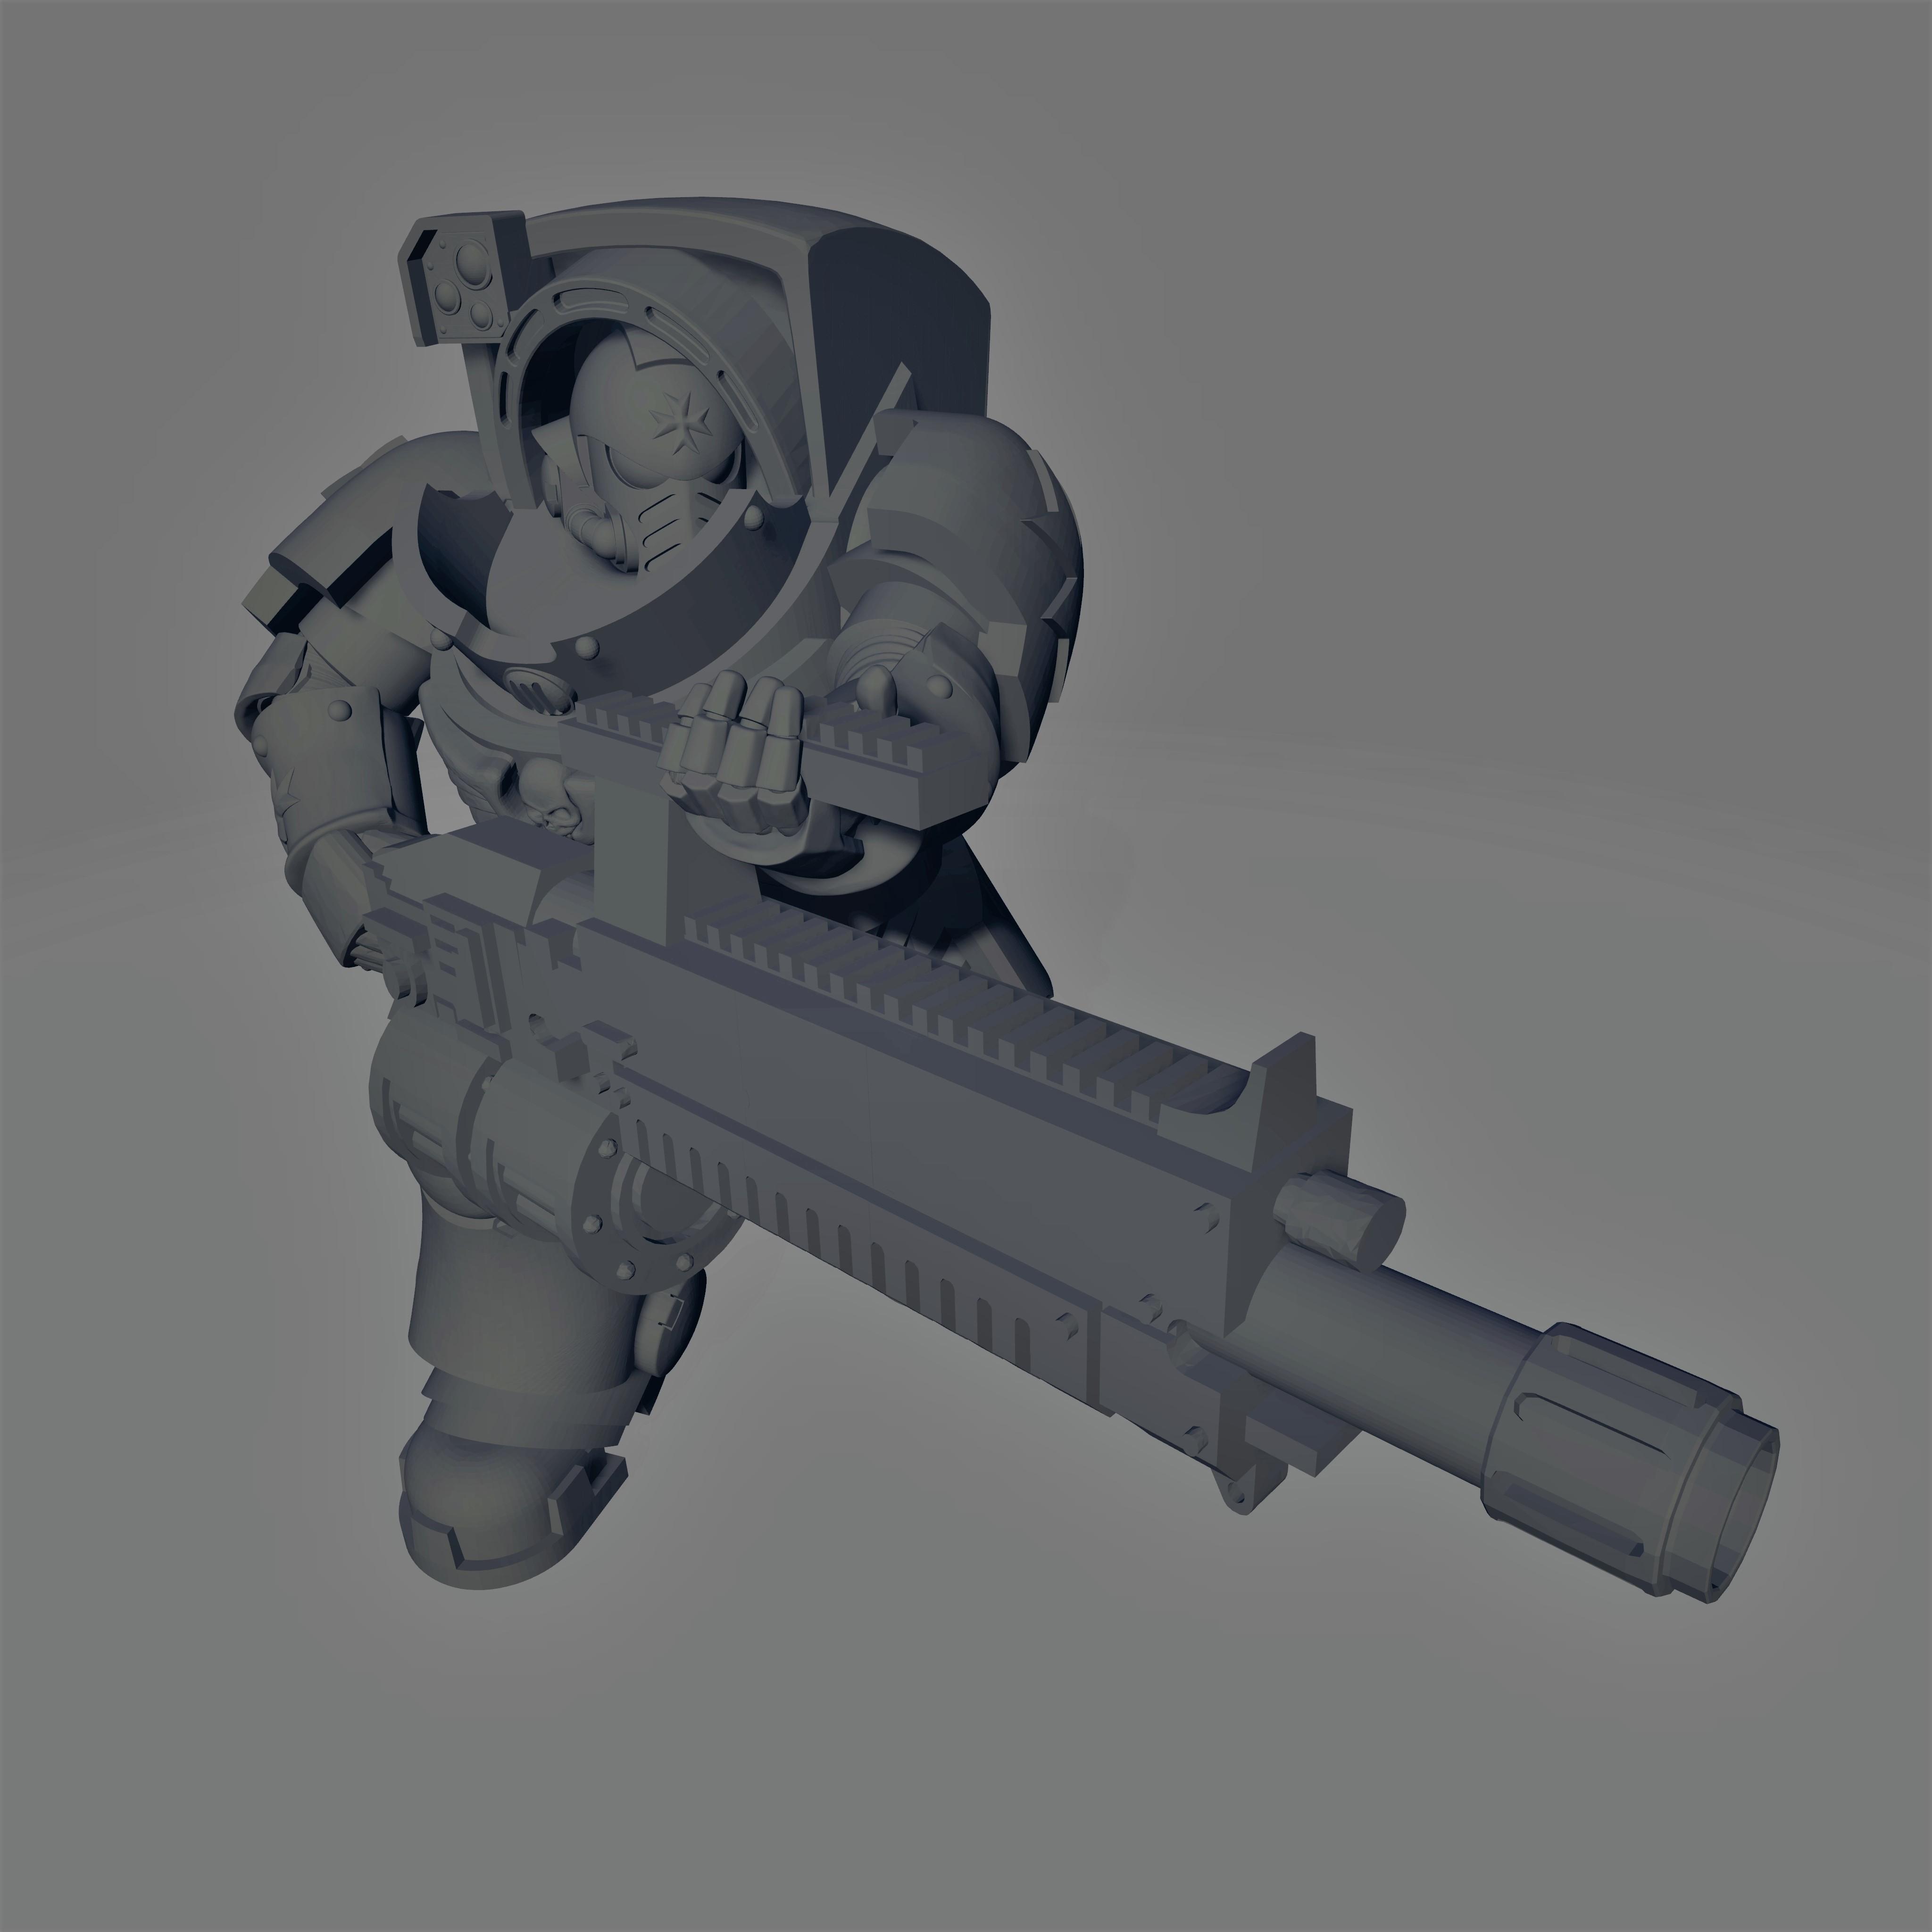 Dark Crusader - Heavy Infantry - Hellstorm Heavy Bolter.jpg Download free STL file Dark Crusader Heavy Infantry Squad • 3D printer model, GrimmTheMaker